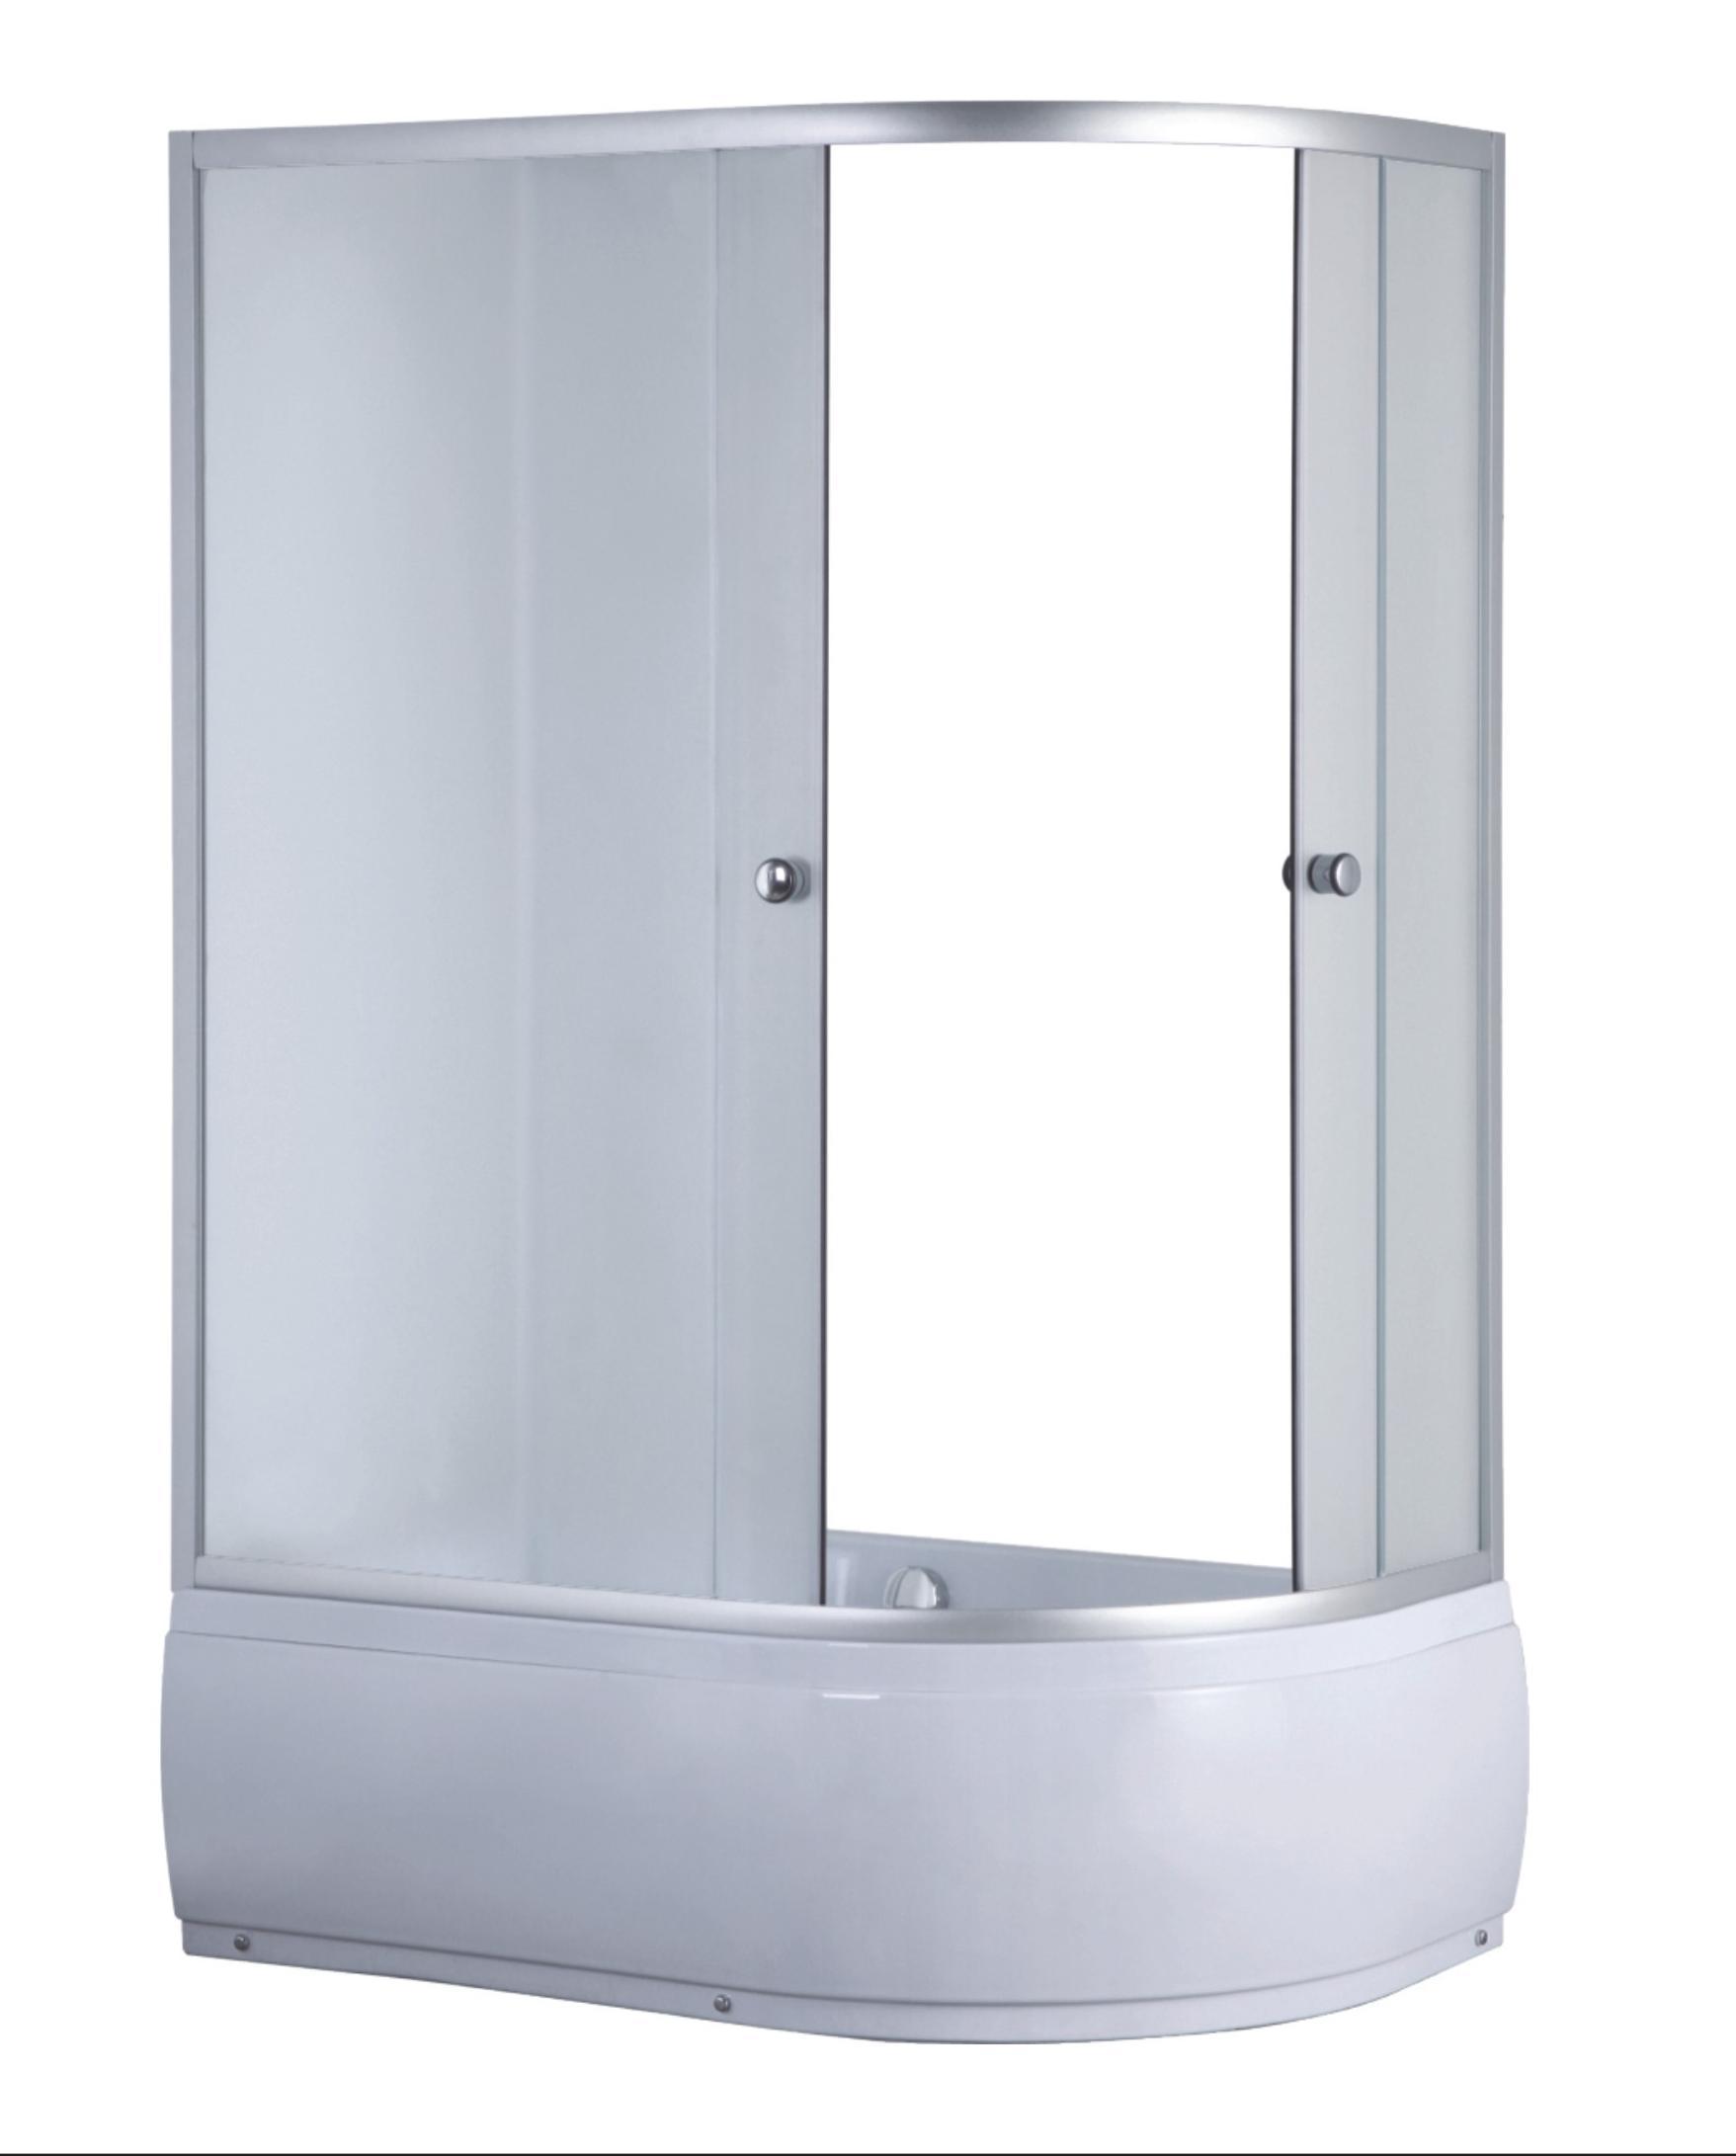 Well DURHAM 120 L W53327 sprchový kout s vysokou vaničkou